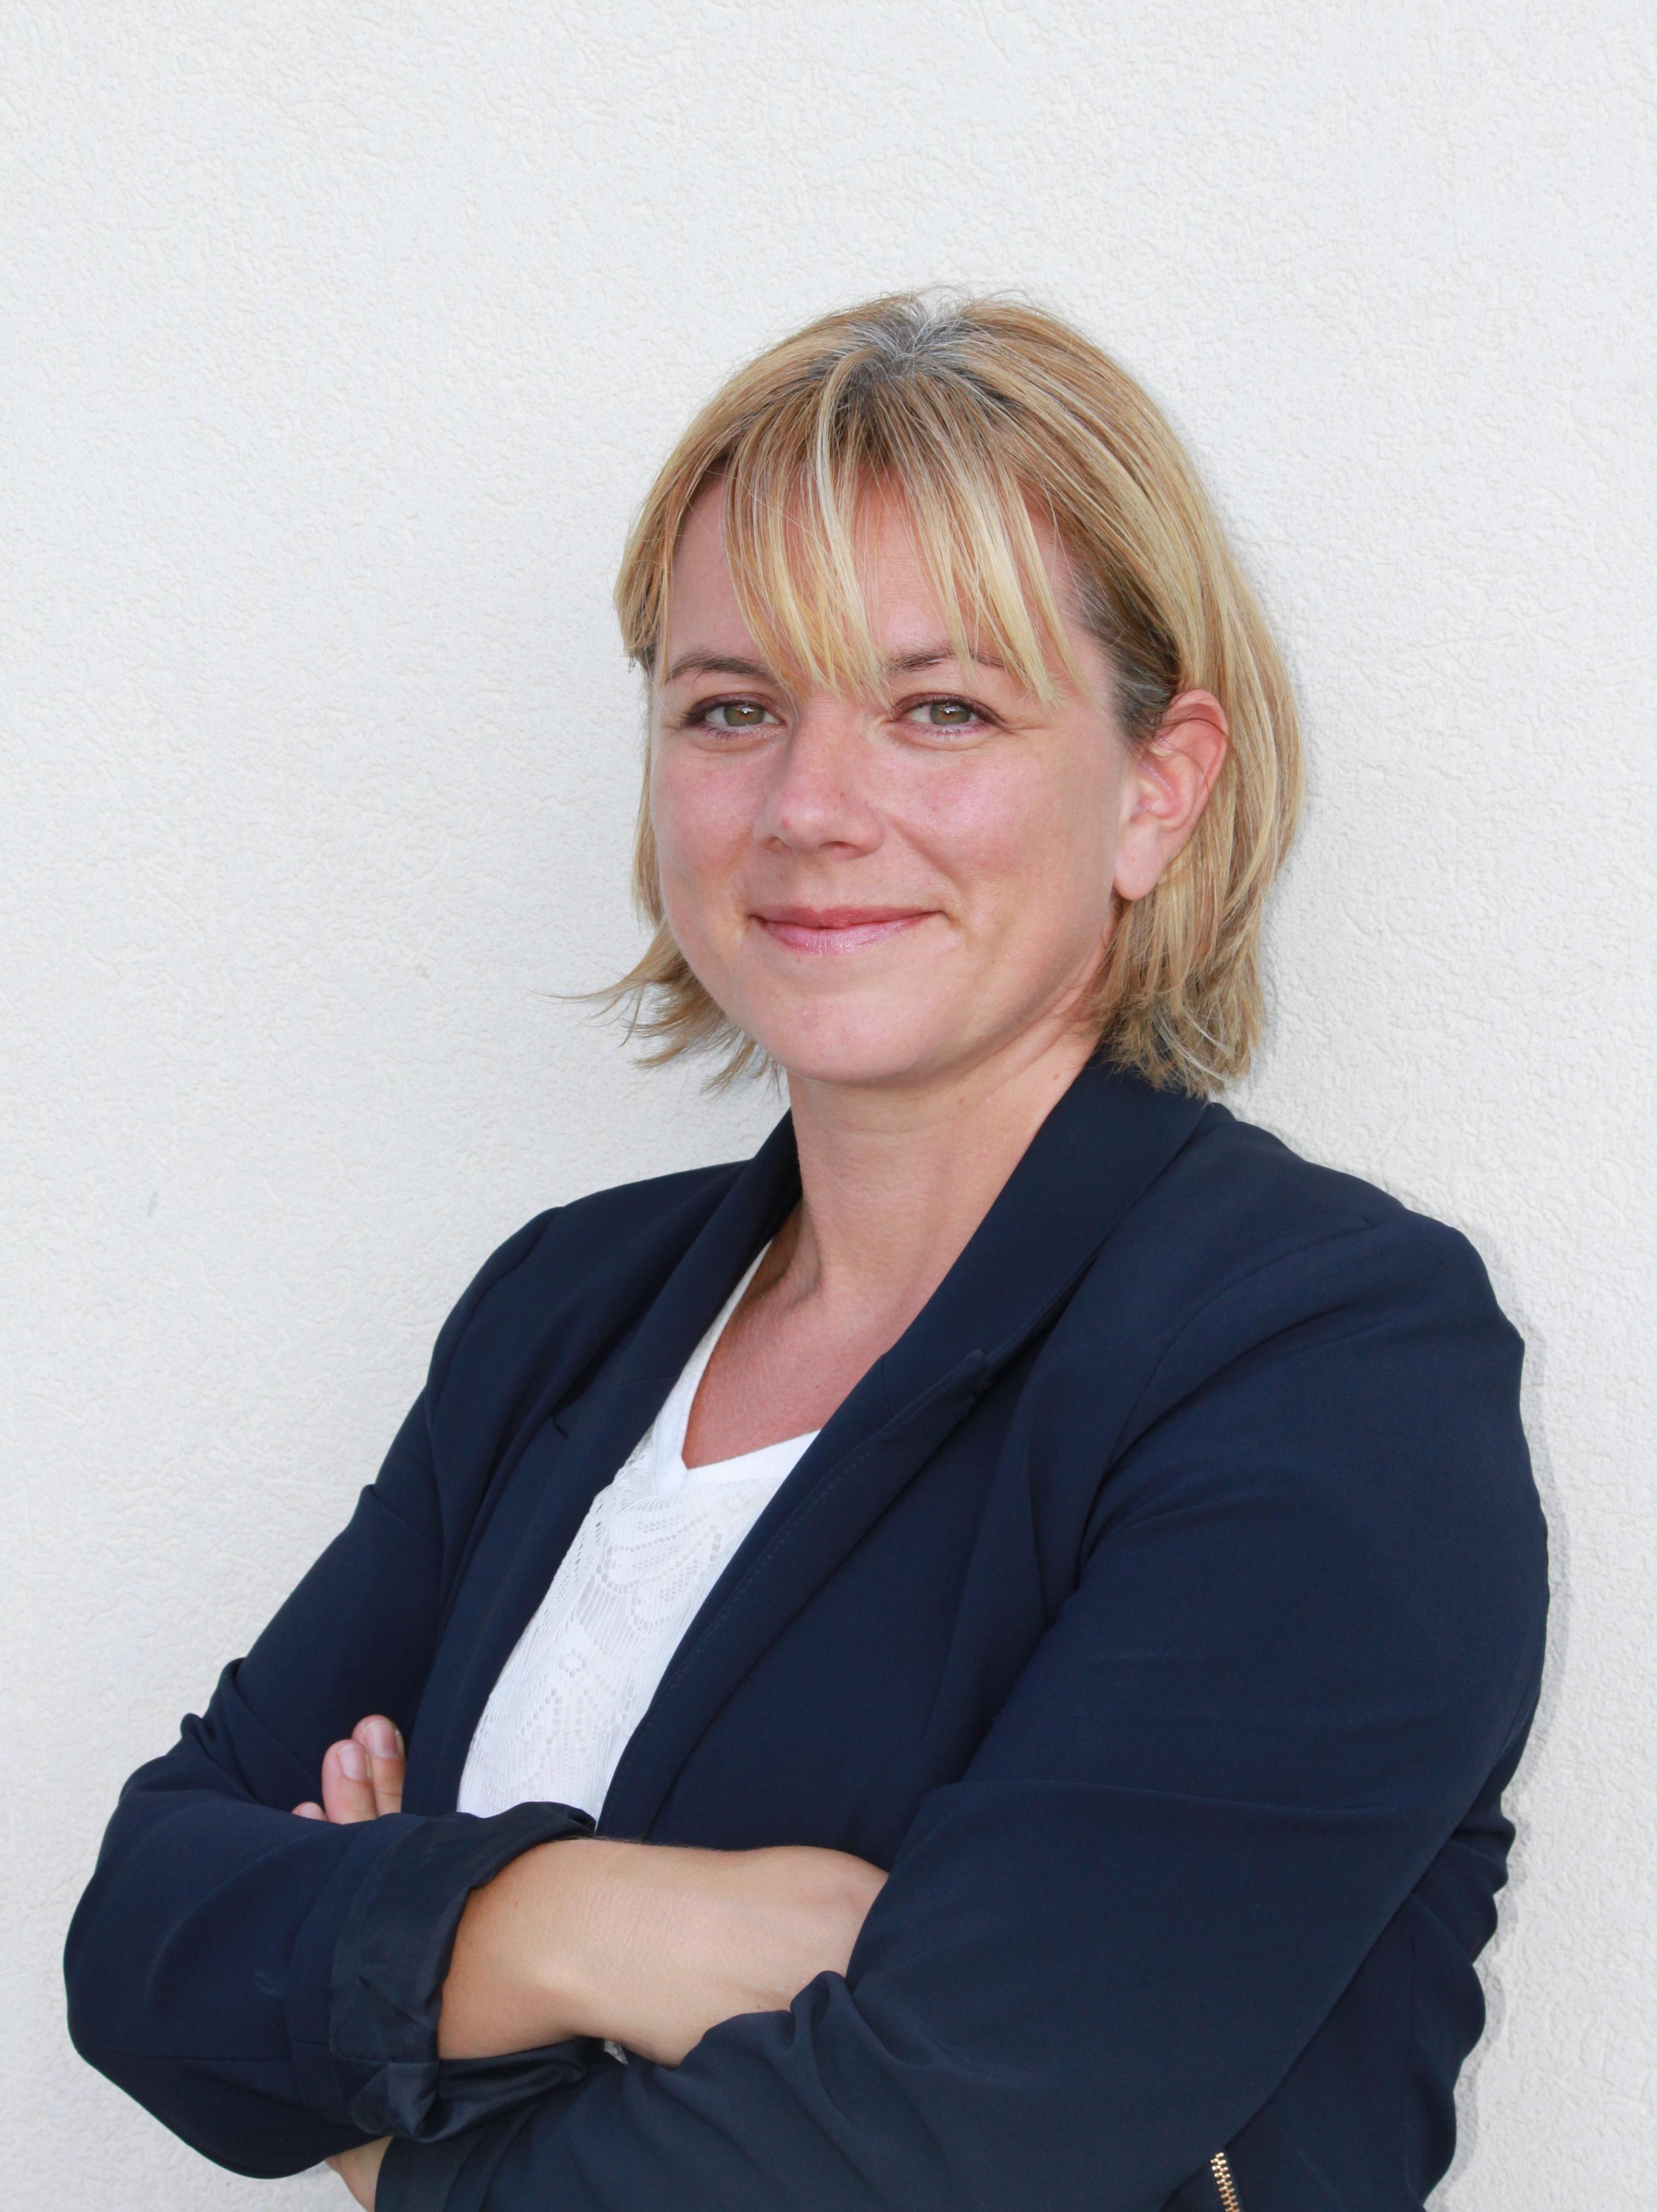 Dr Sarah Azzopardi Ljubibratic